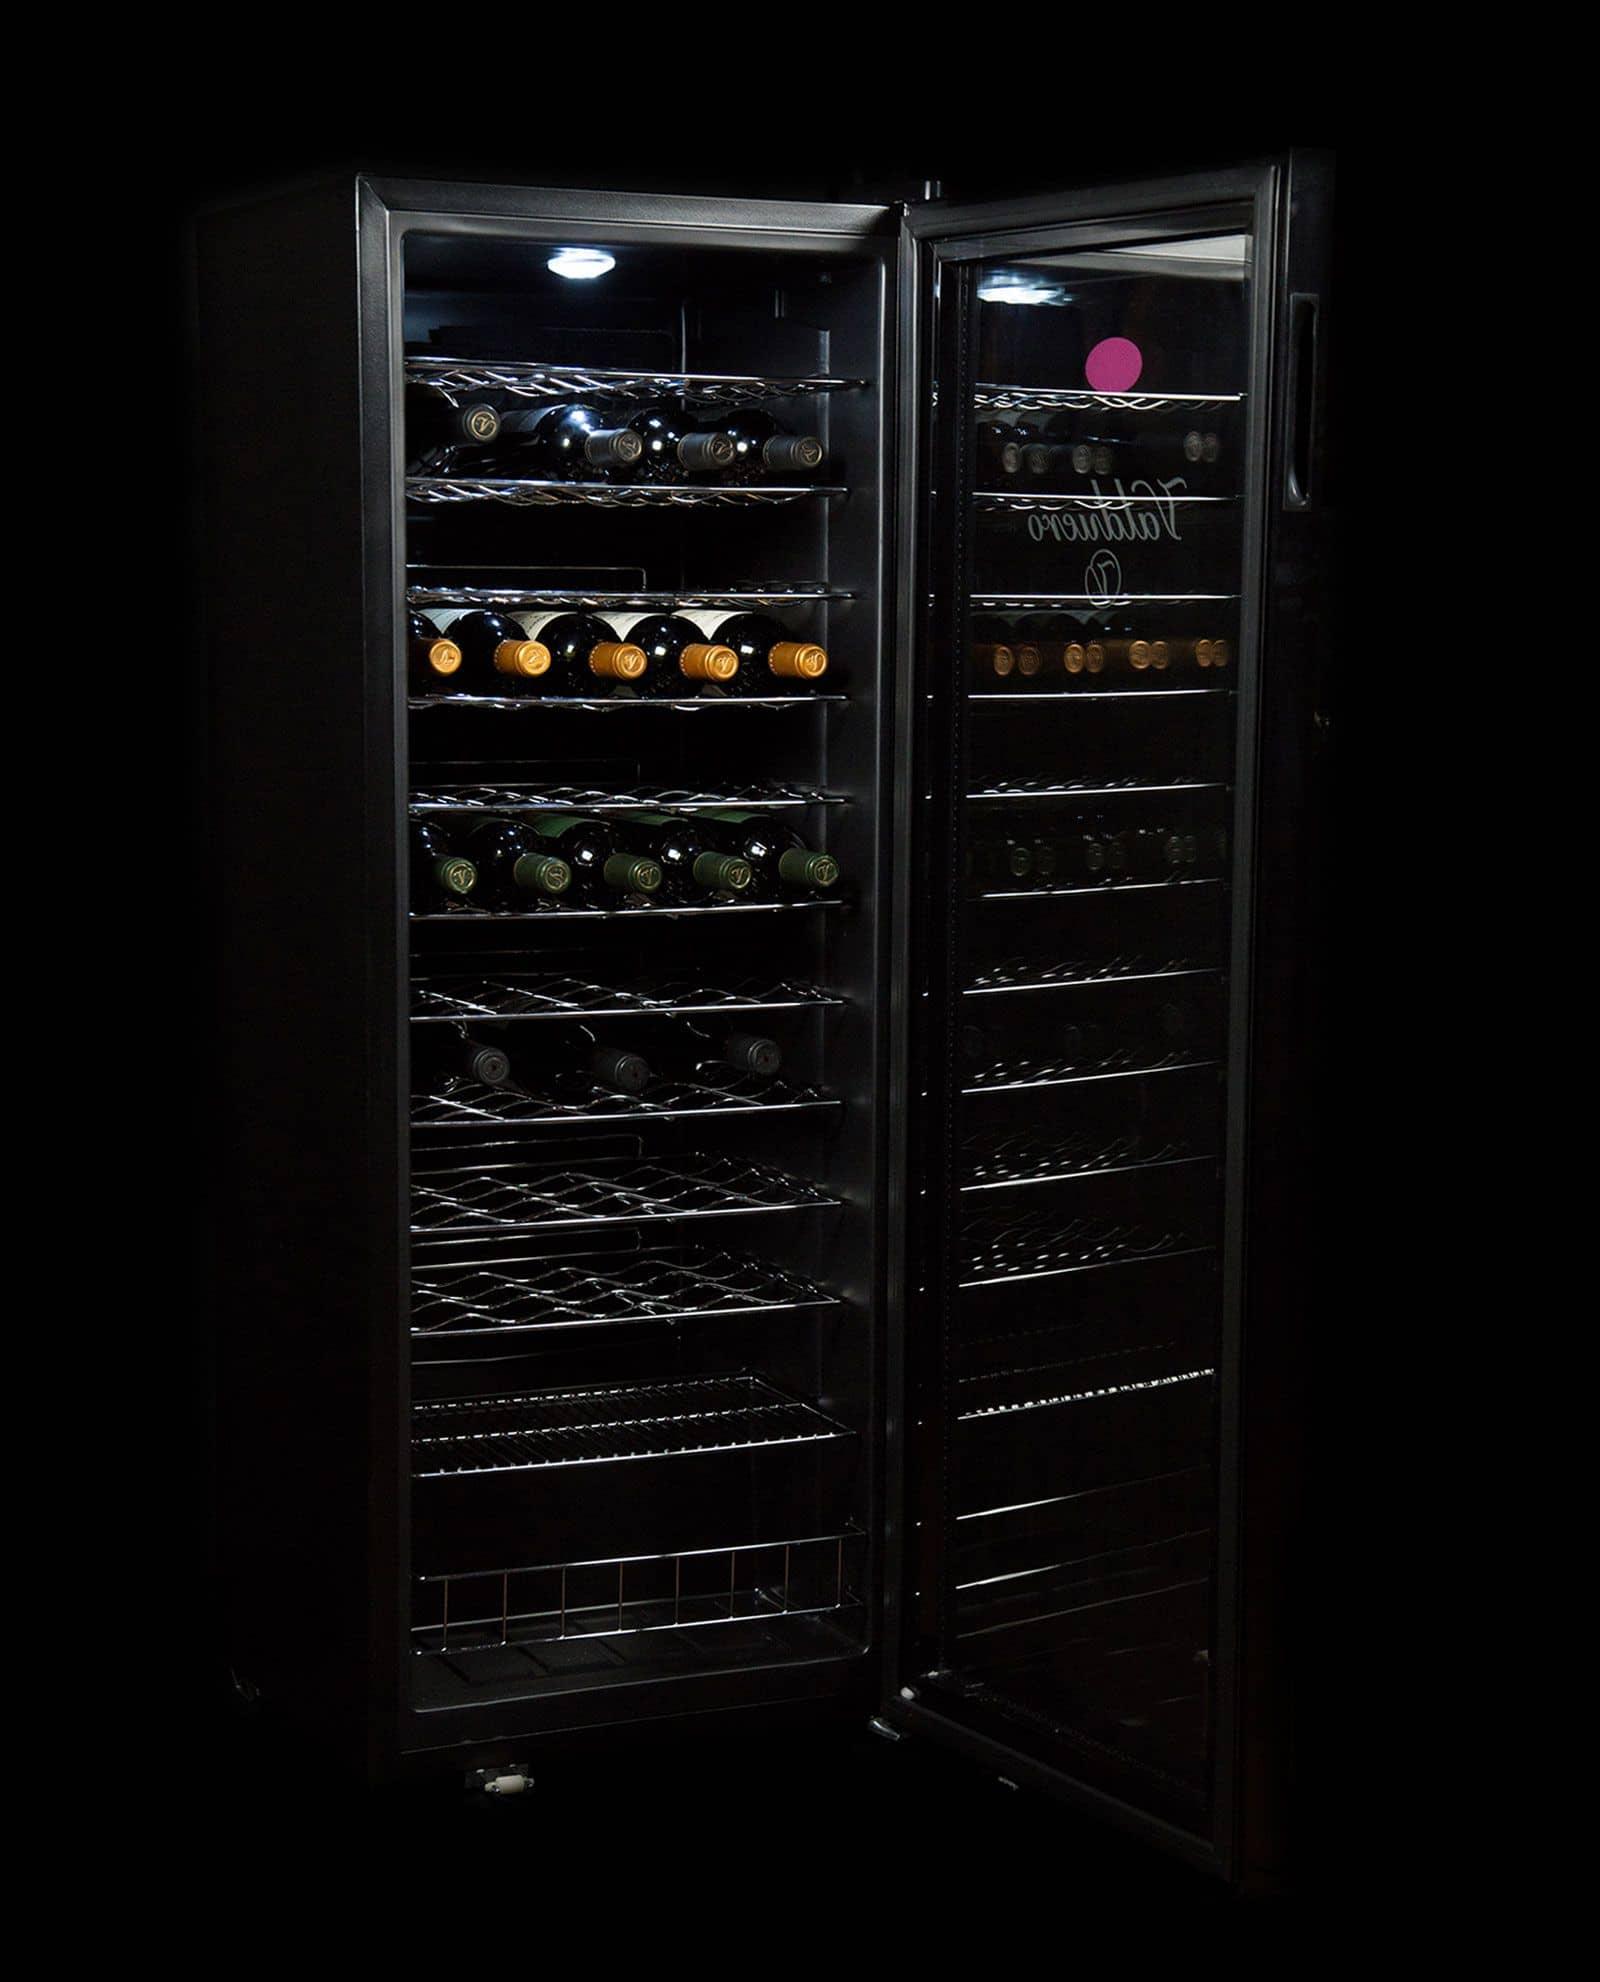 Cava de vinos Bodegas Valduero, accesorios de vino Ribera del Duero